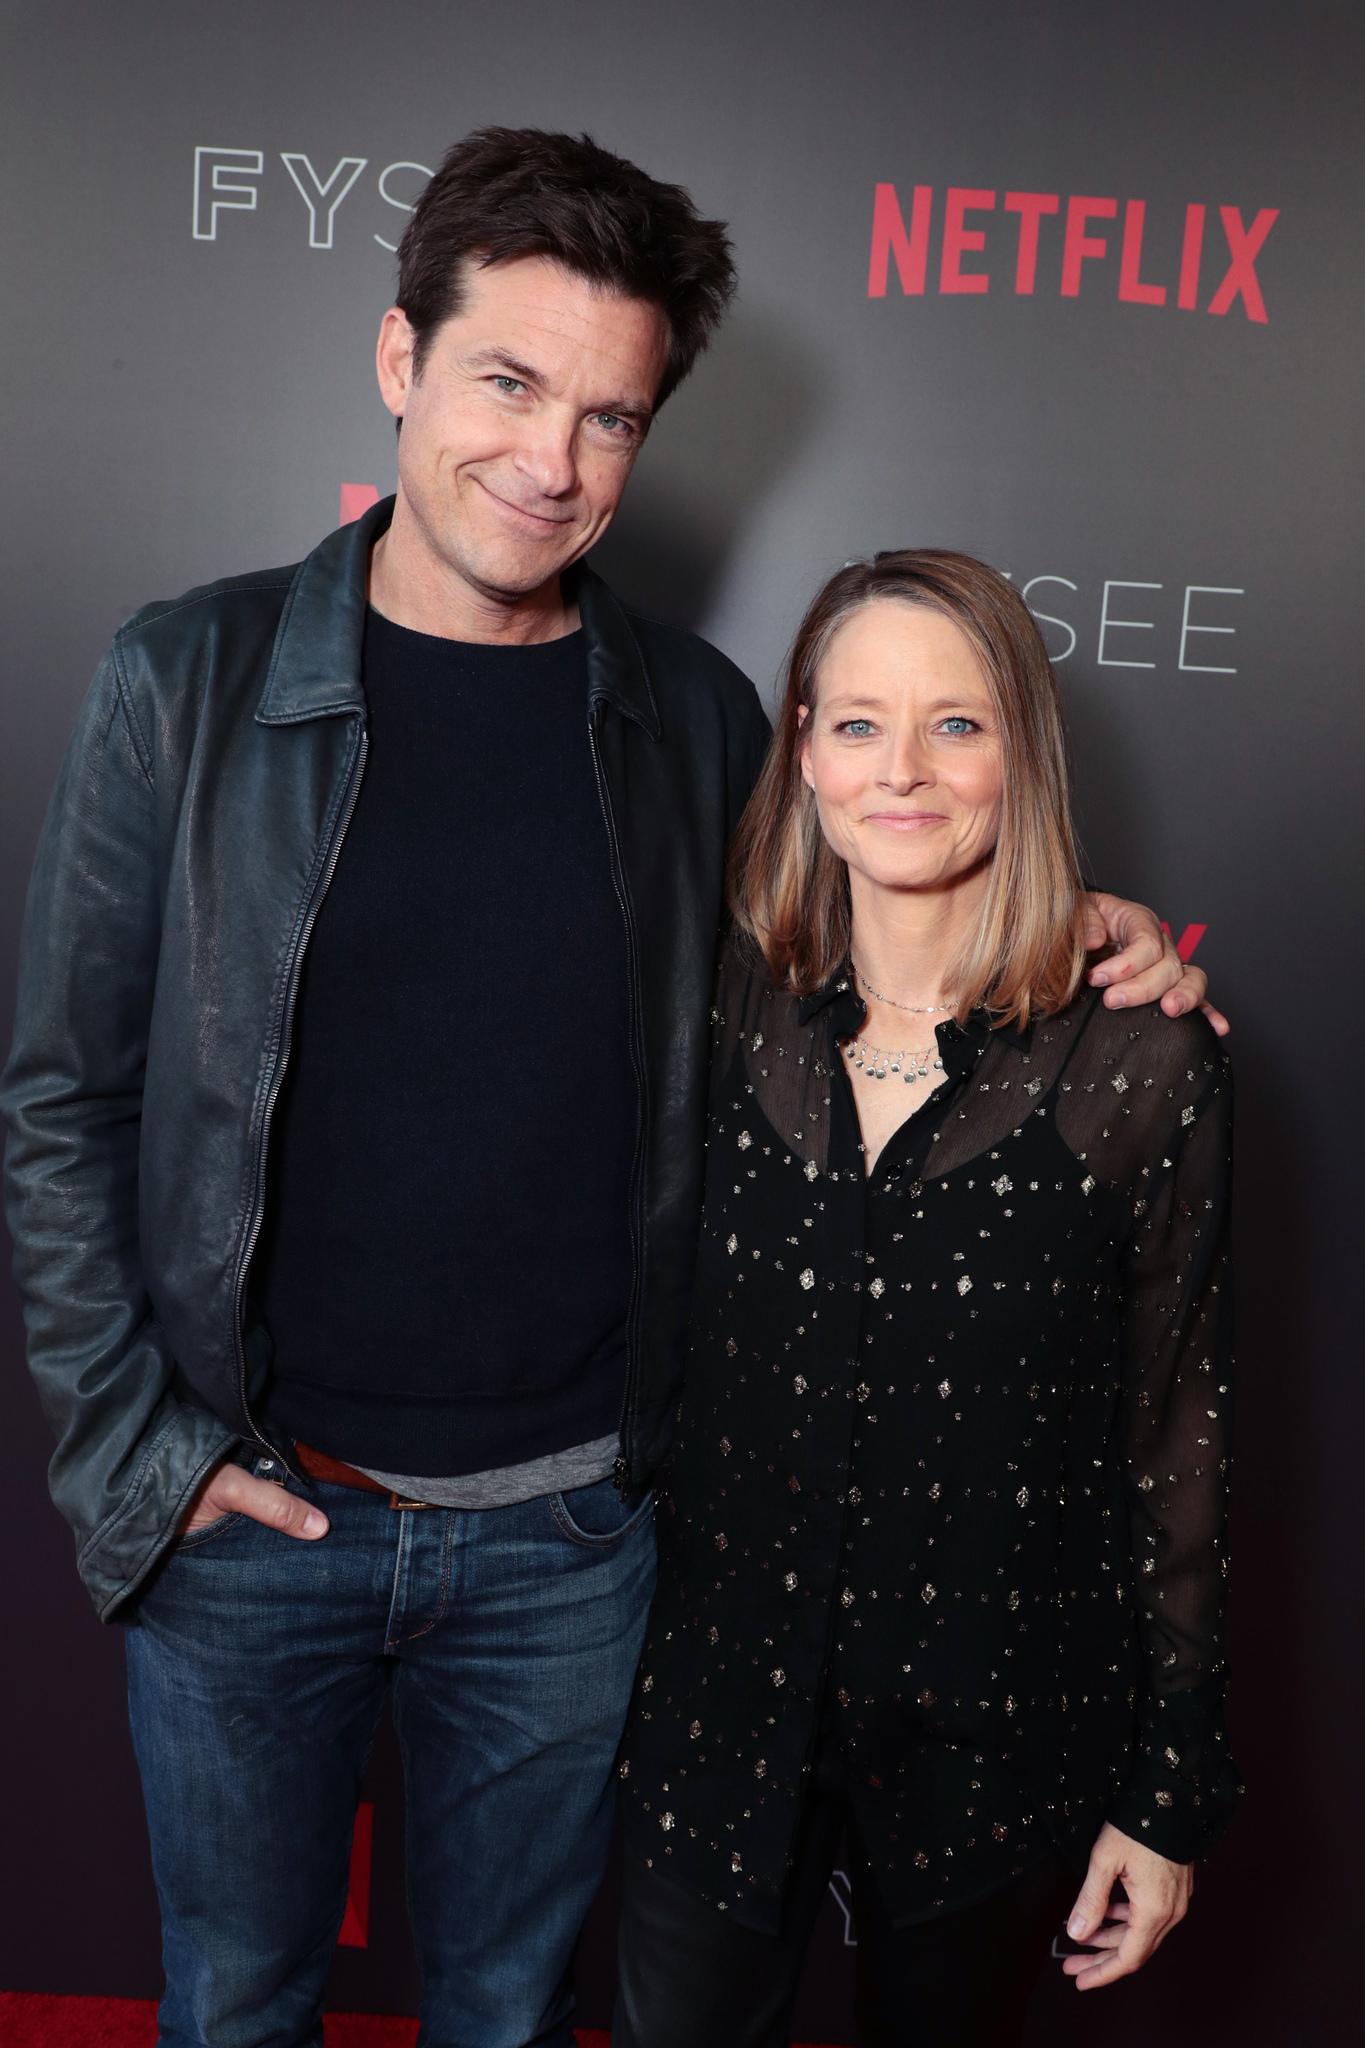 Jodie Foster and Jason Bateman at an event for Black Mirror (2011)